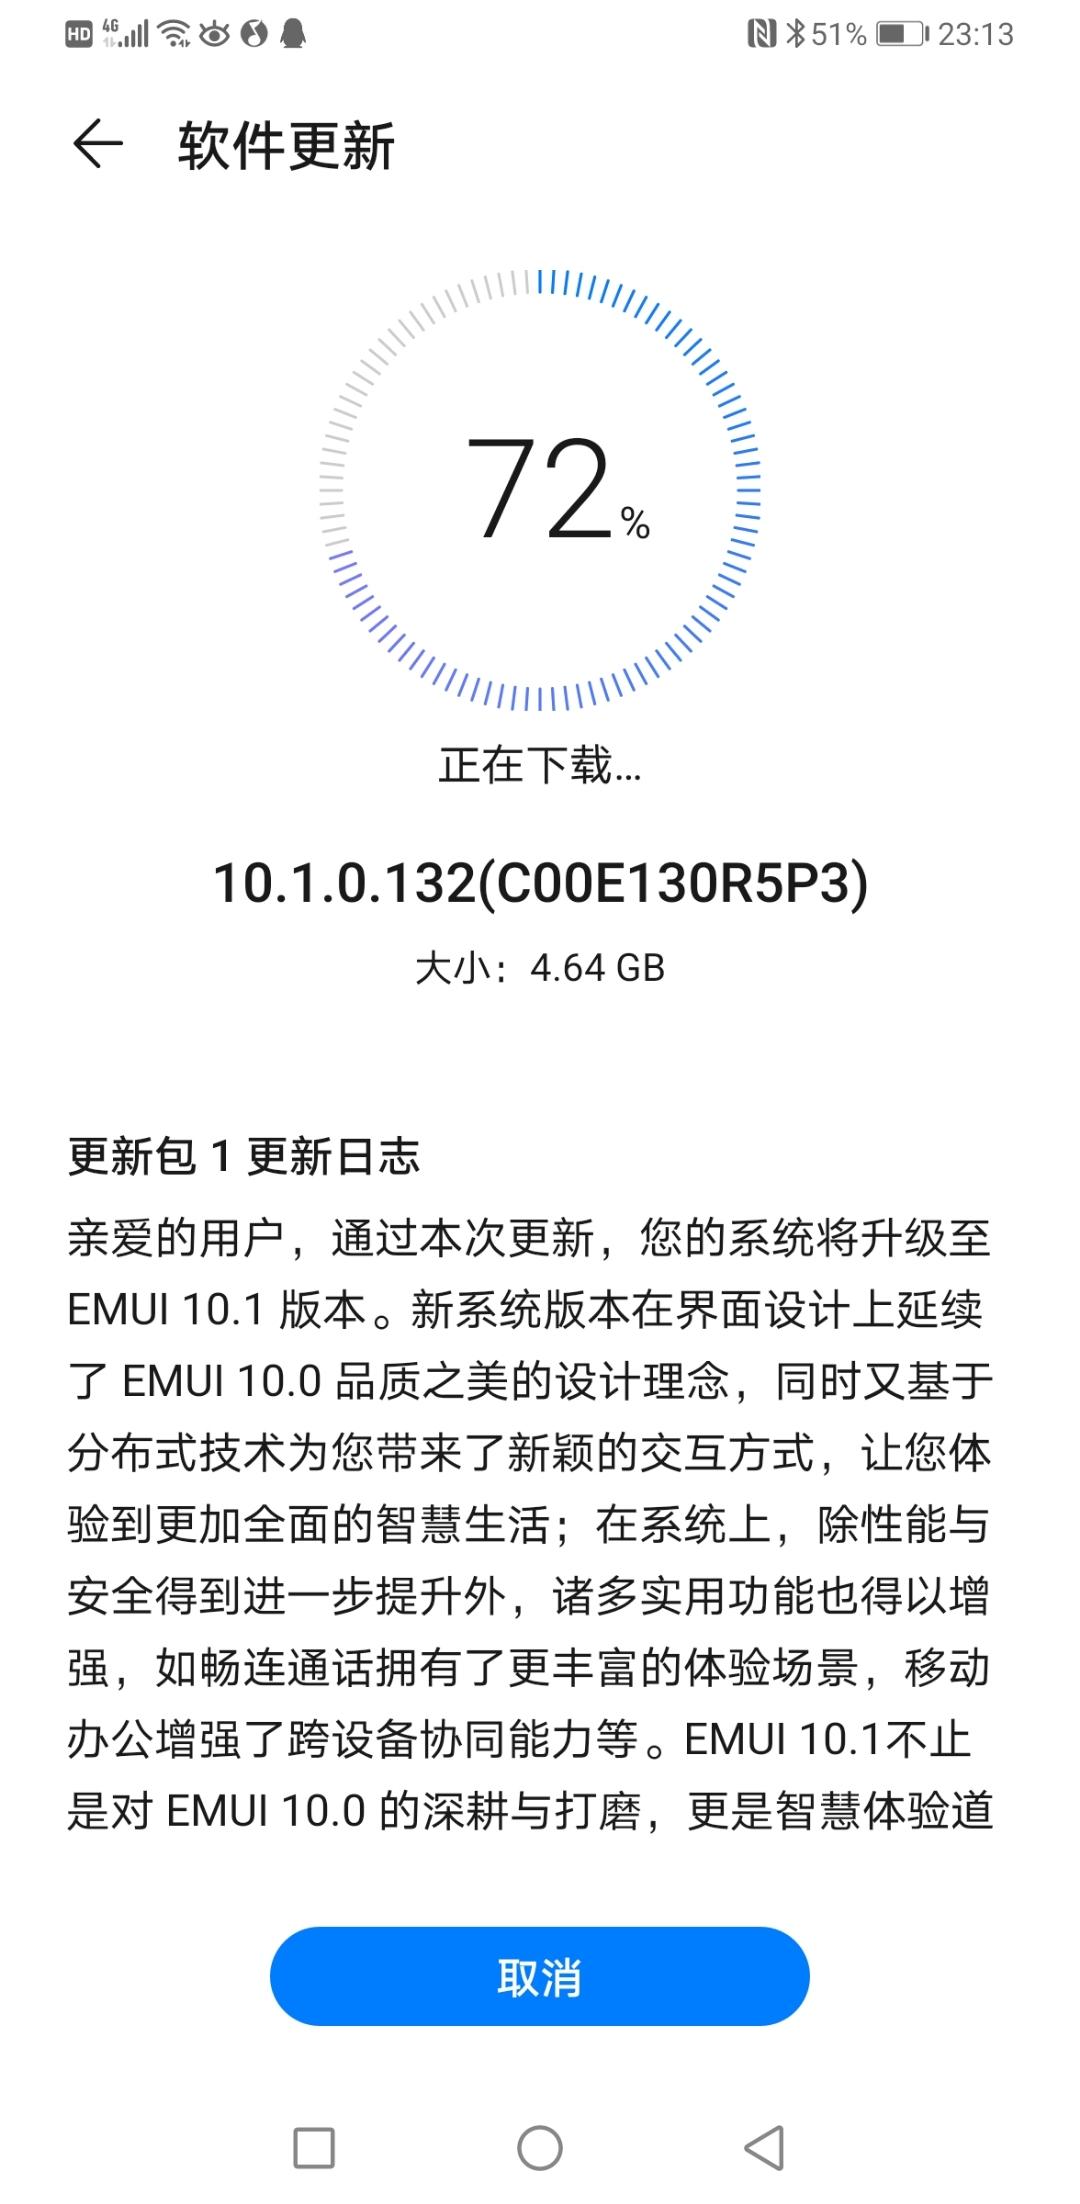 Screenshot_20200515_231321_com.huawei.android.hwouc.jpg